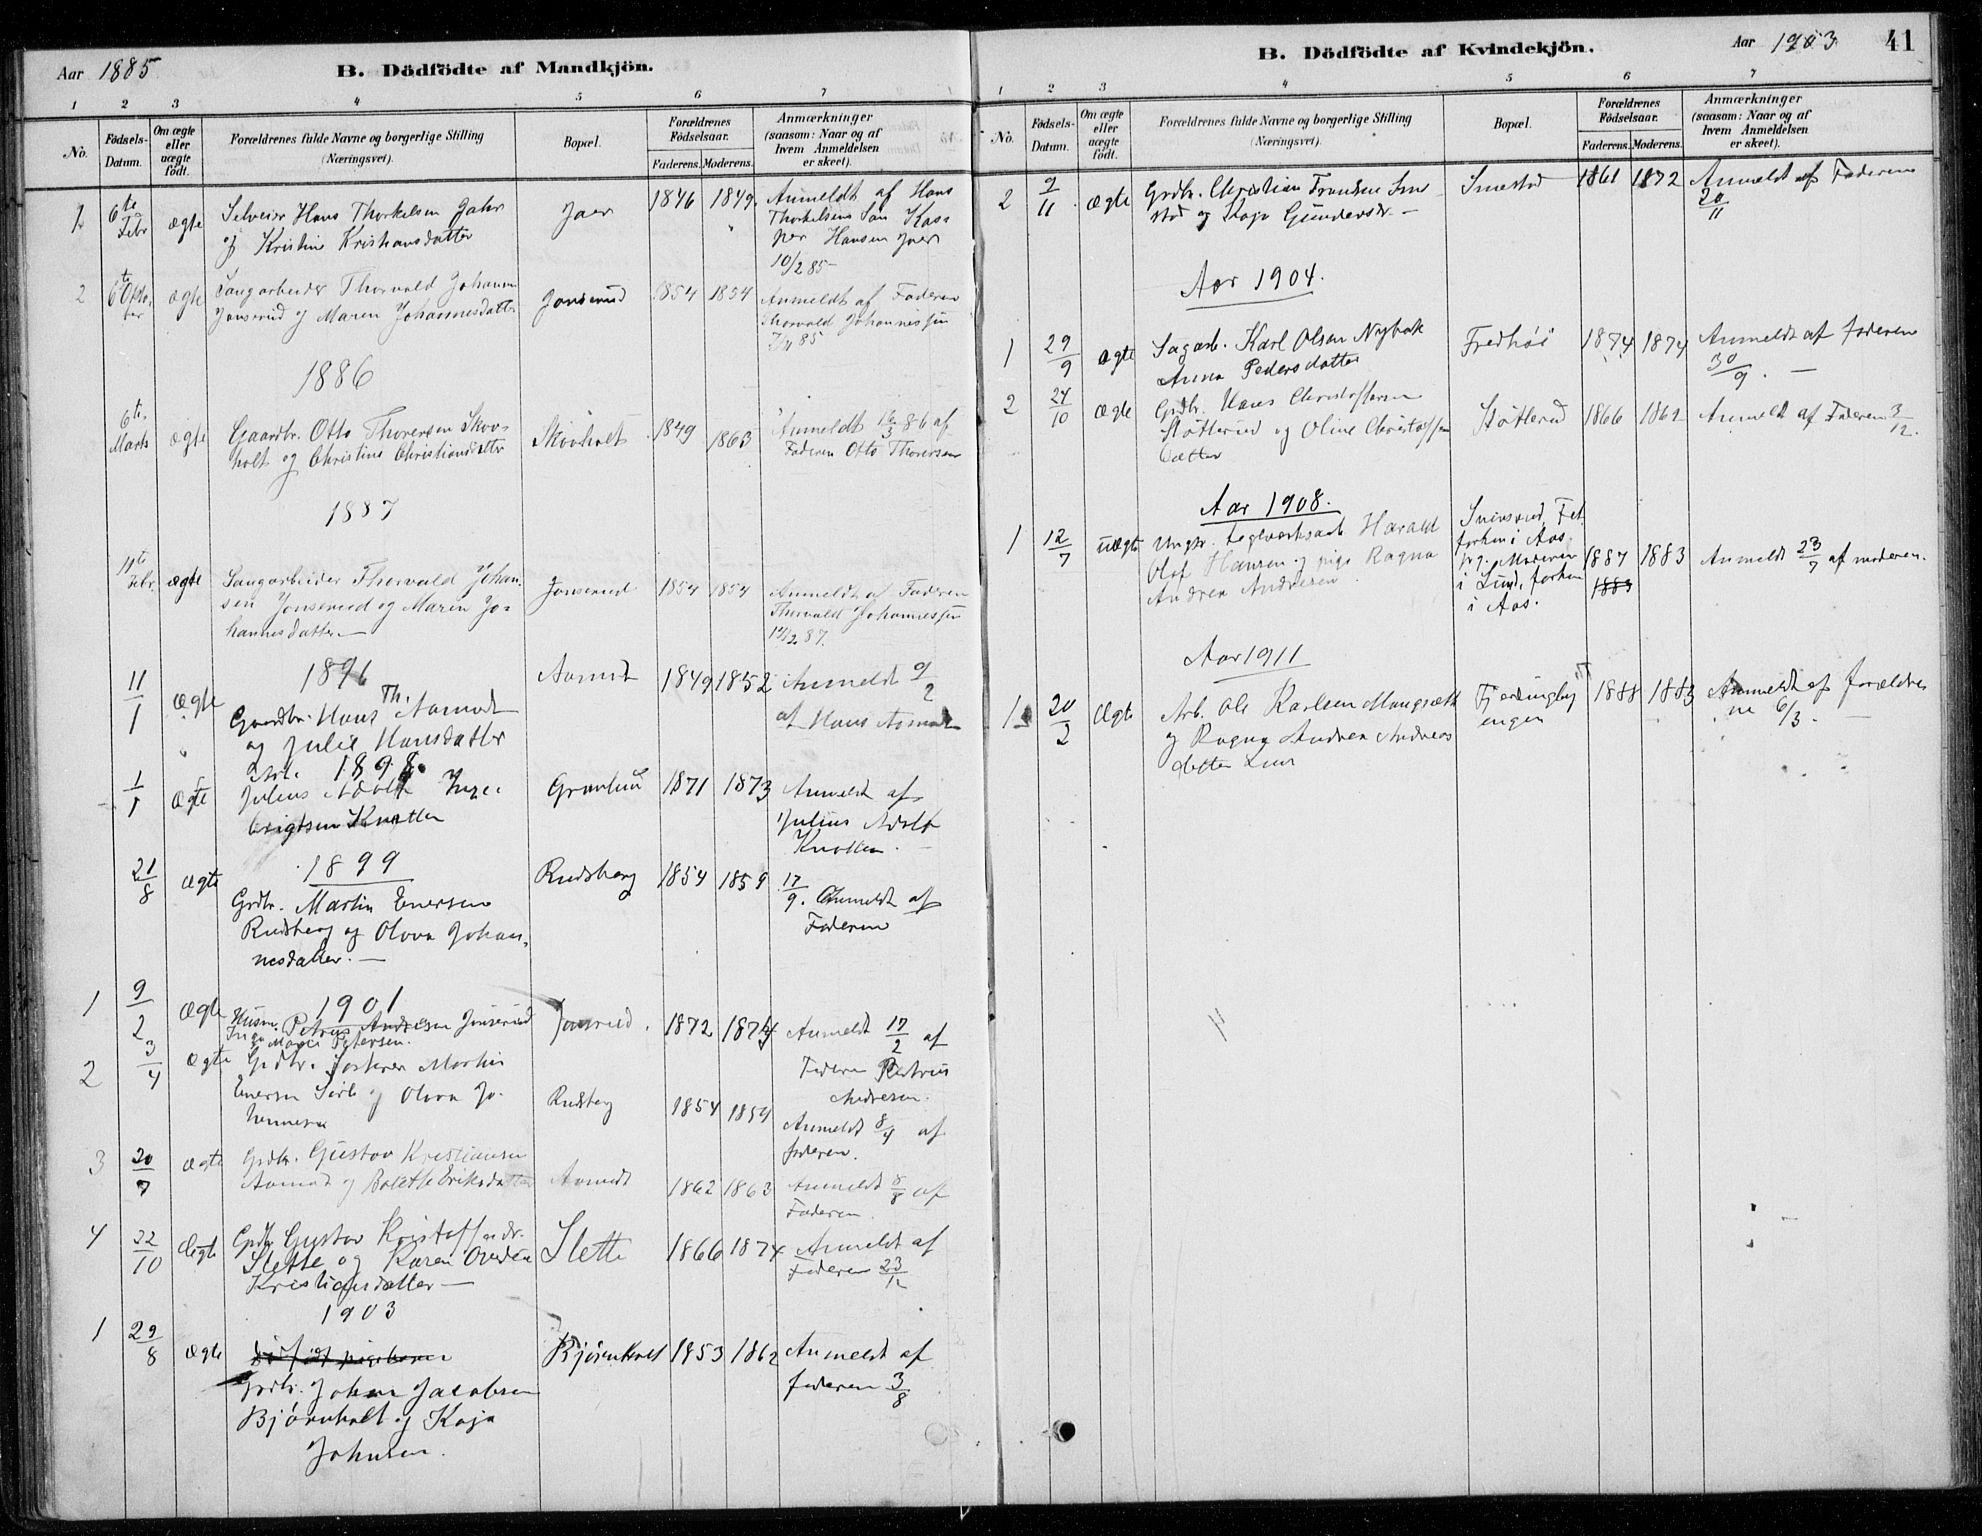 SAO, Fet prestekontor Kirkebøker, G/Gb/L0002: Klokkerbok nr. II 2, 1878-1911, s. 41